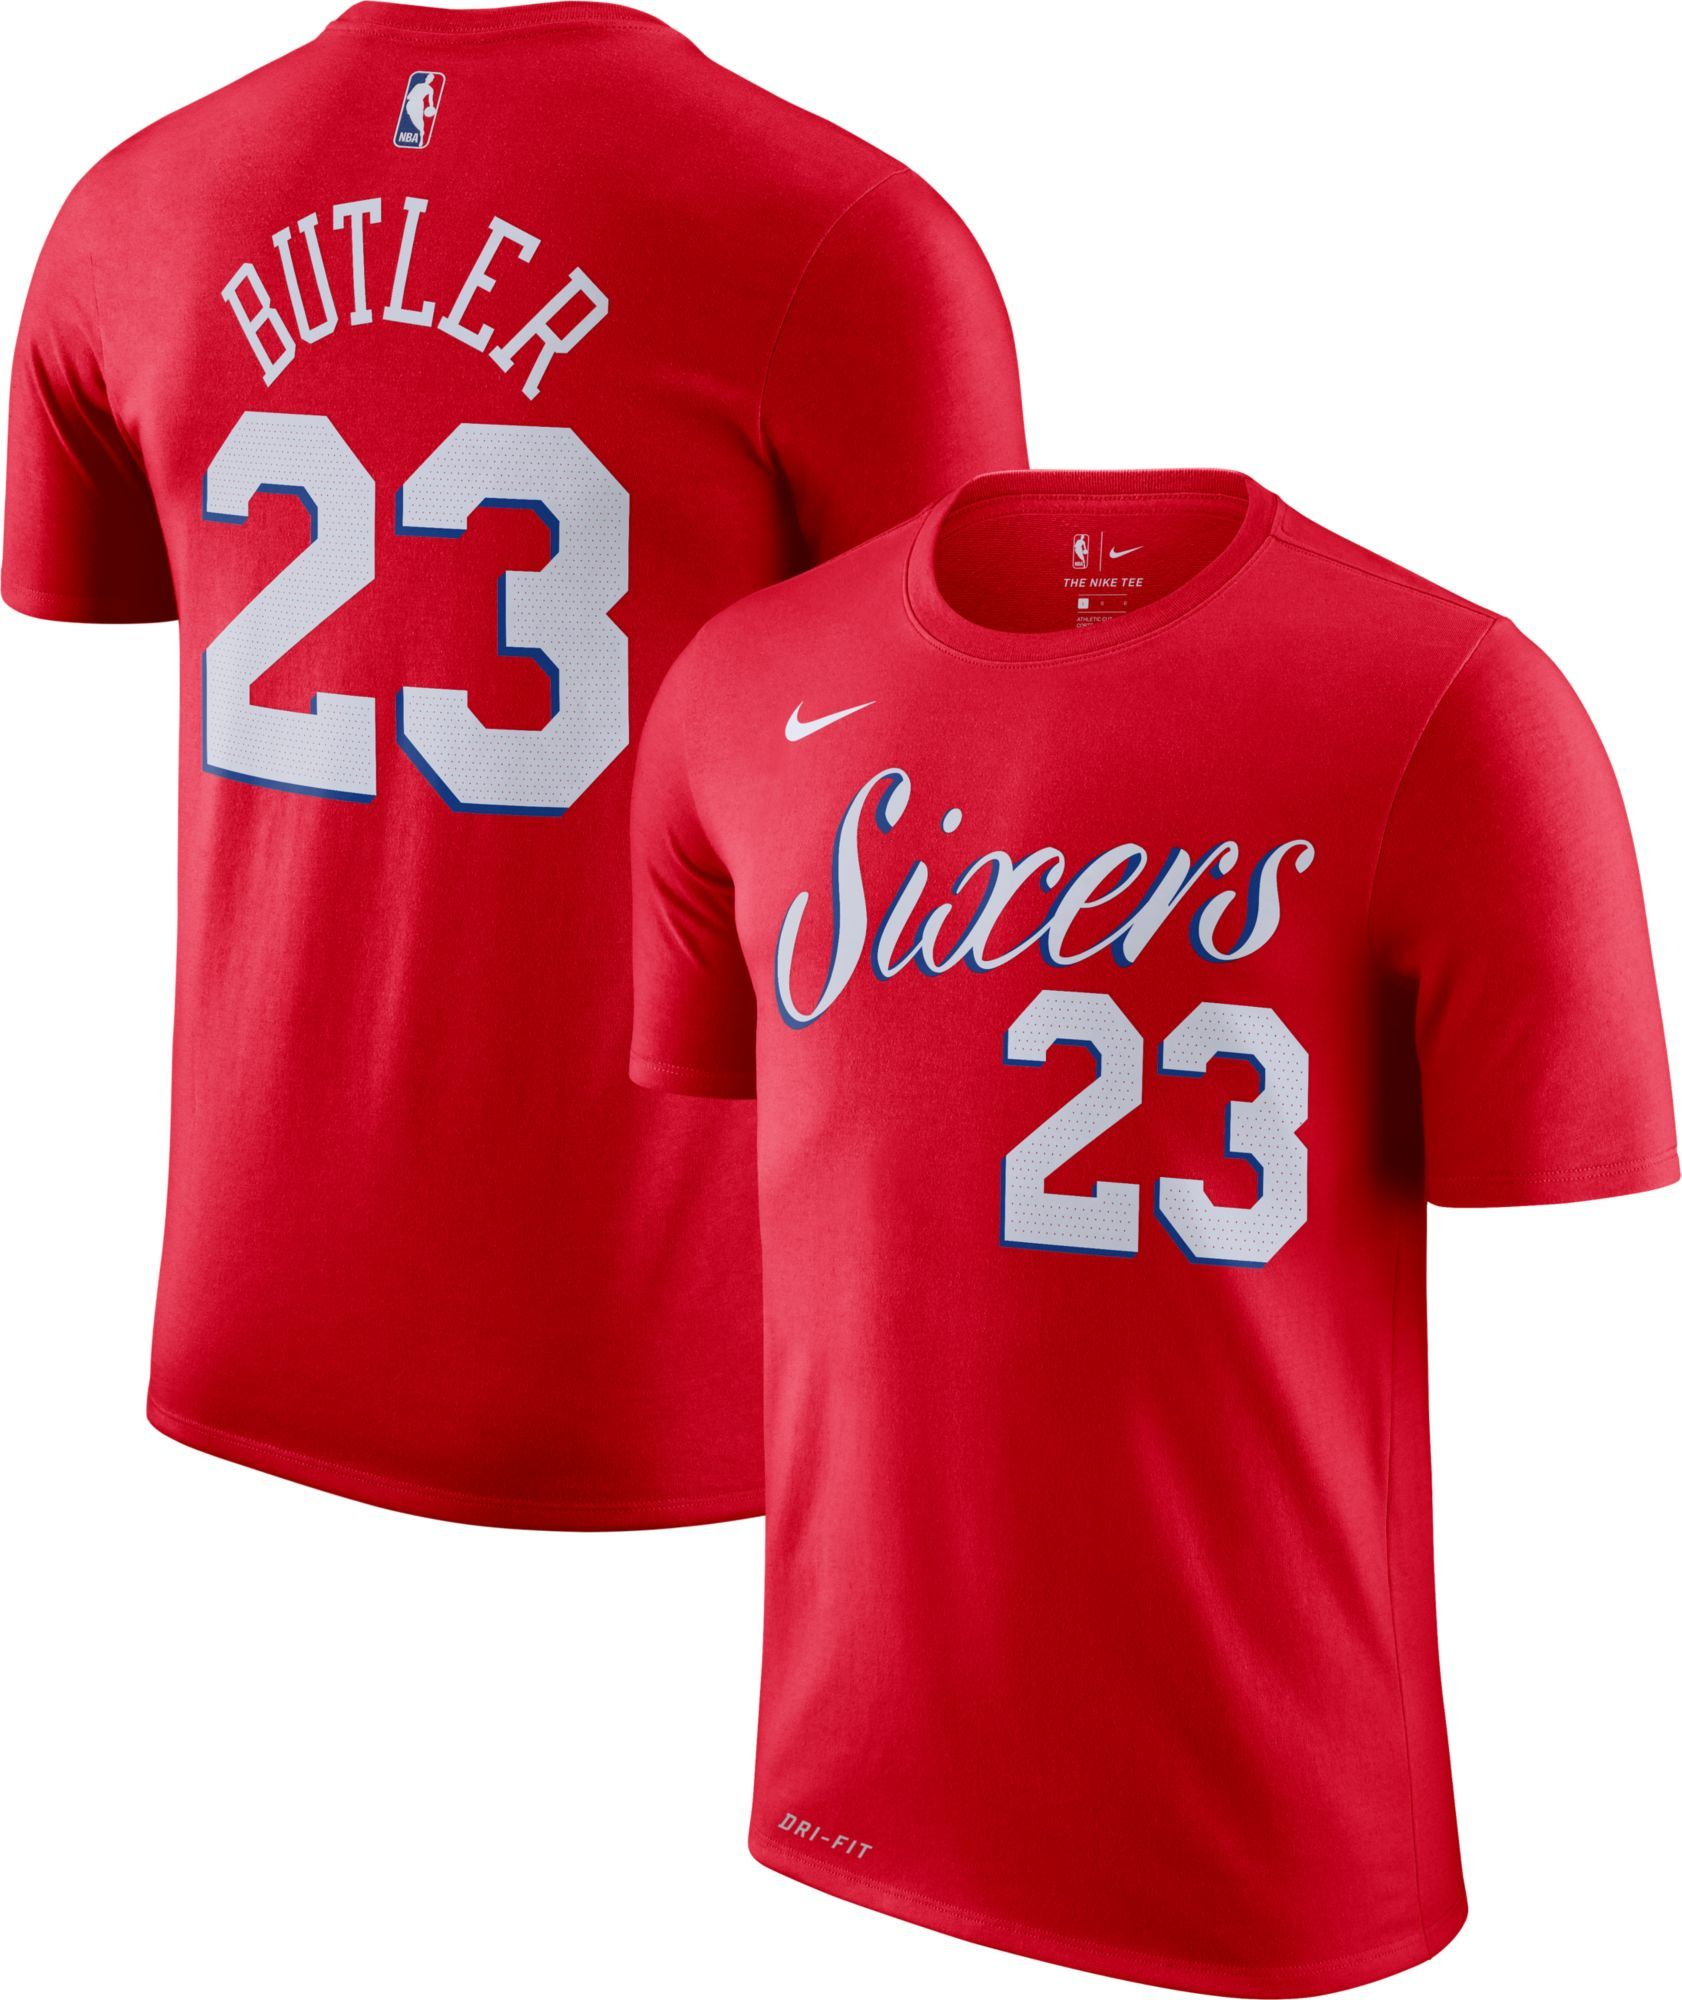 save off fa202 979b6 Nike Men's Philadelphia 76ers Jimmy Butler #23 Dri-FIT Red T ...